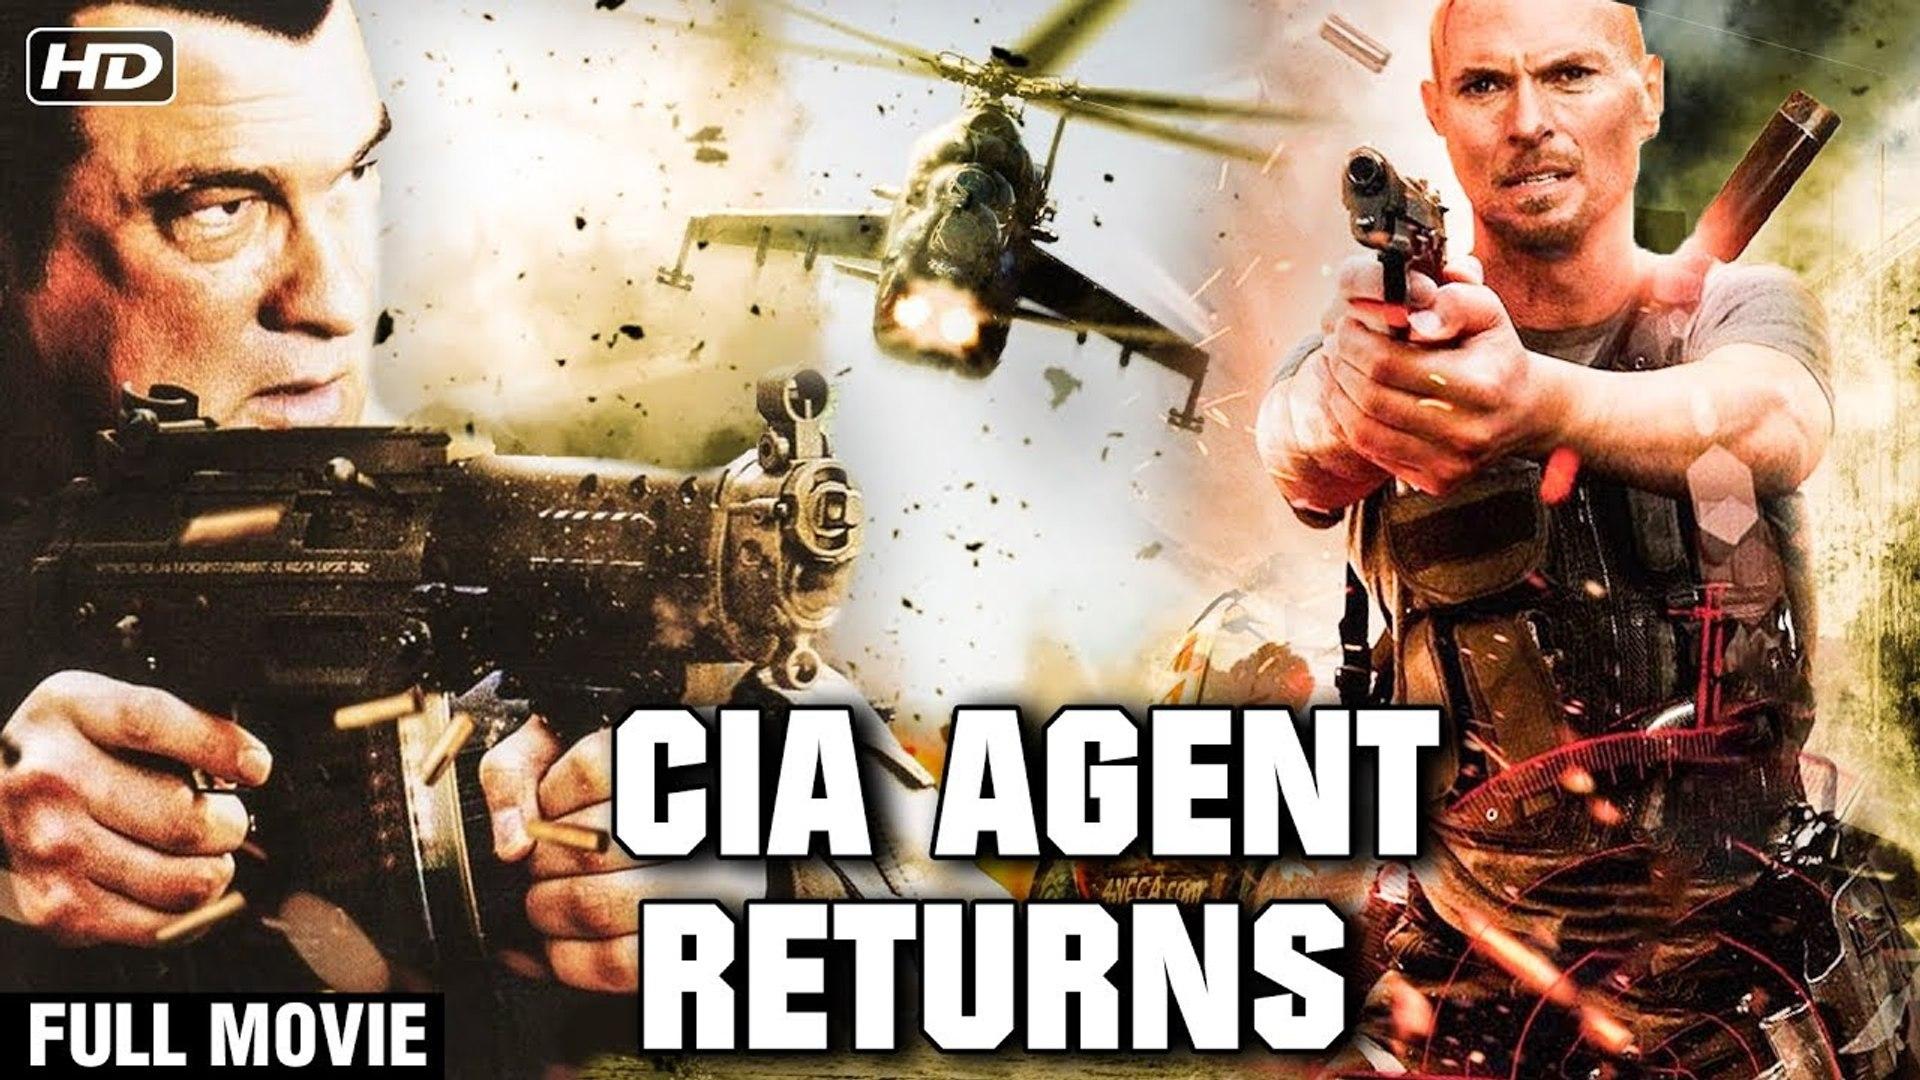 C.I.A Agent Returns Full Hindi Movie - Super Hit Hollywood Movie In Hindi - Luke Goss - Action Movie